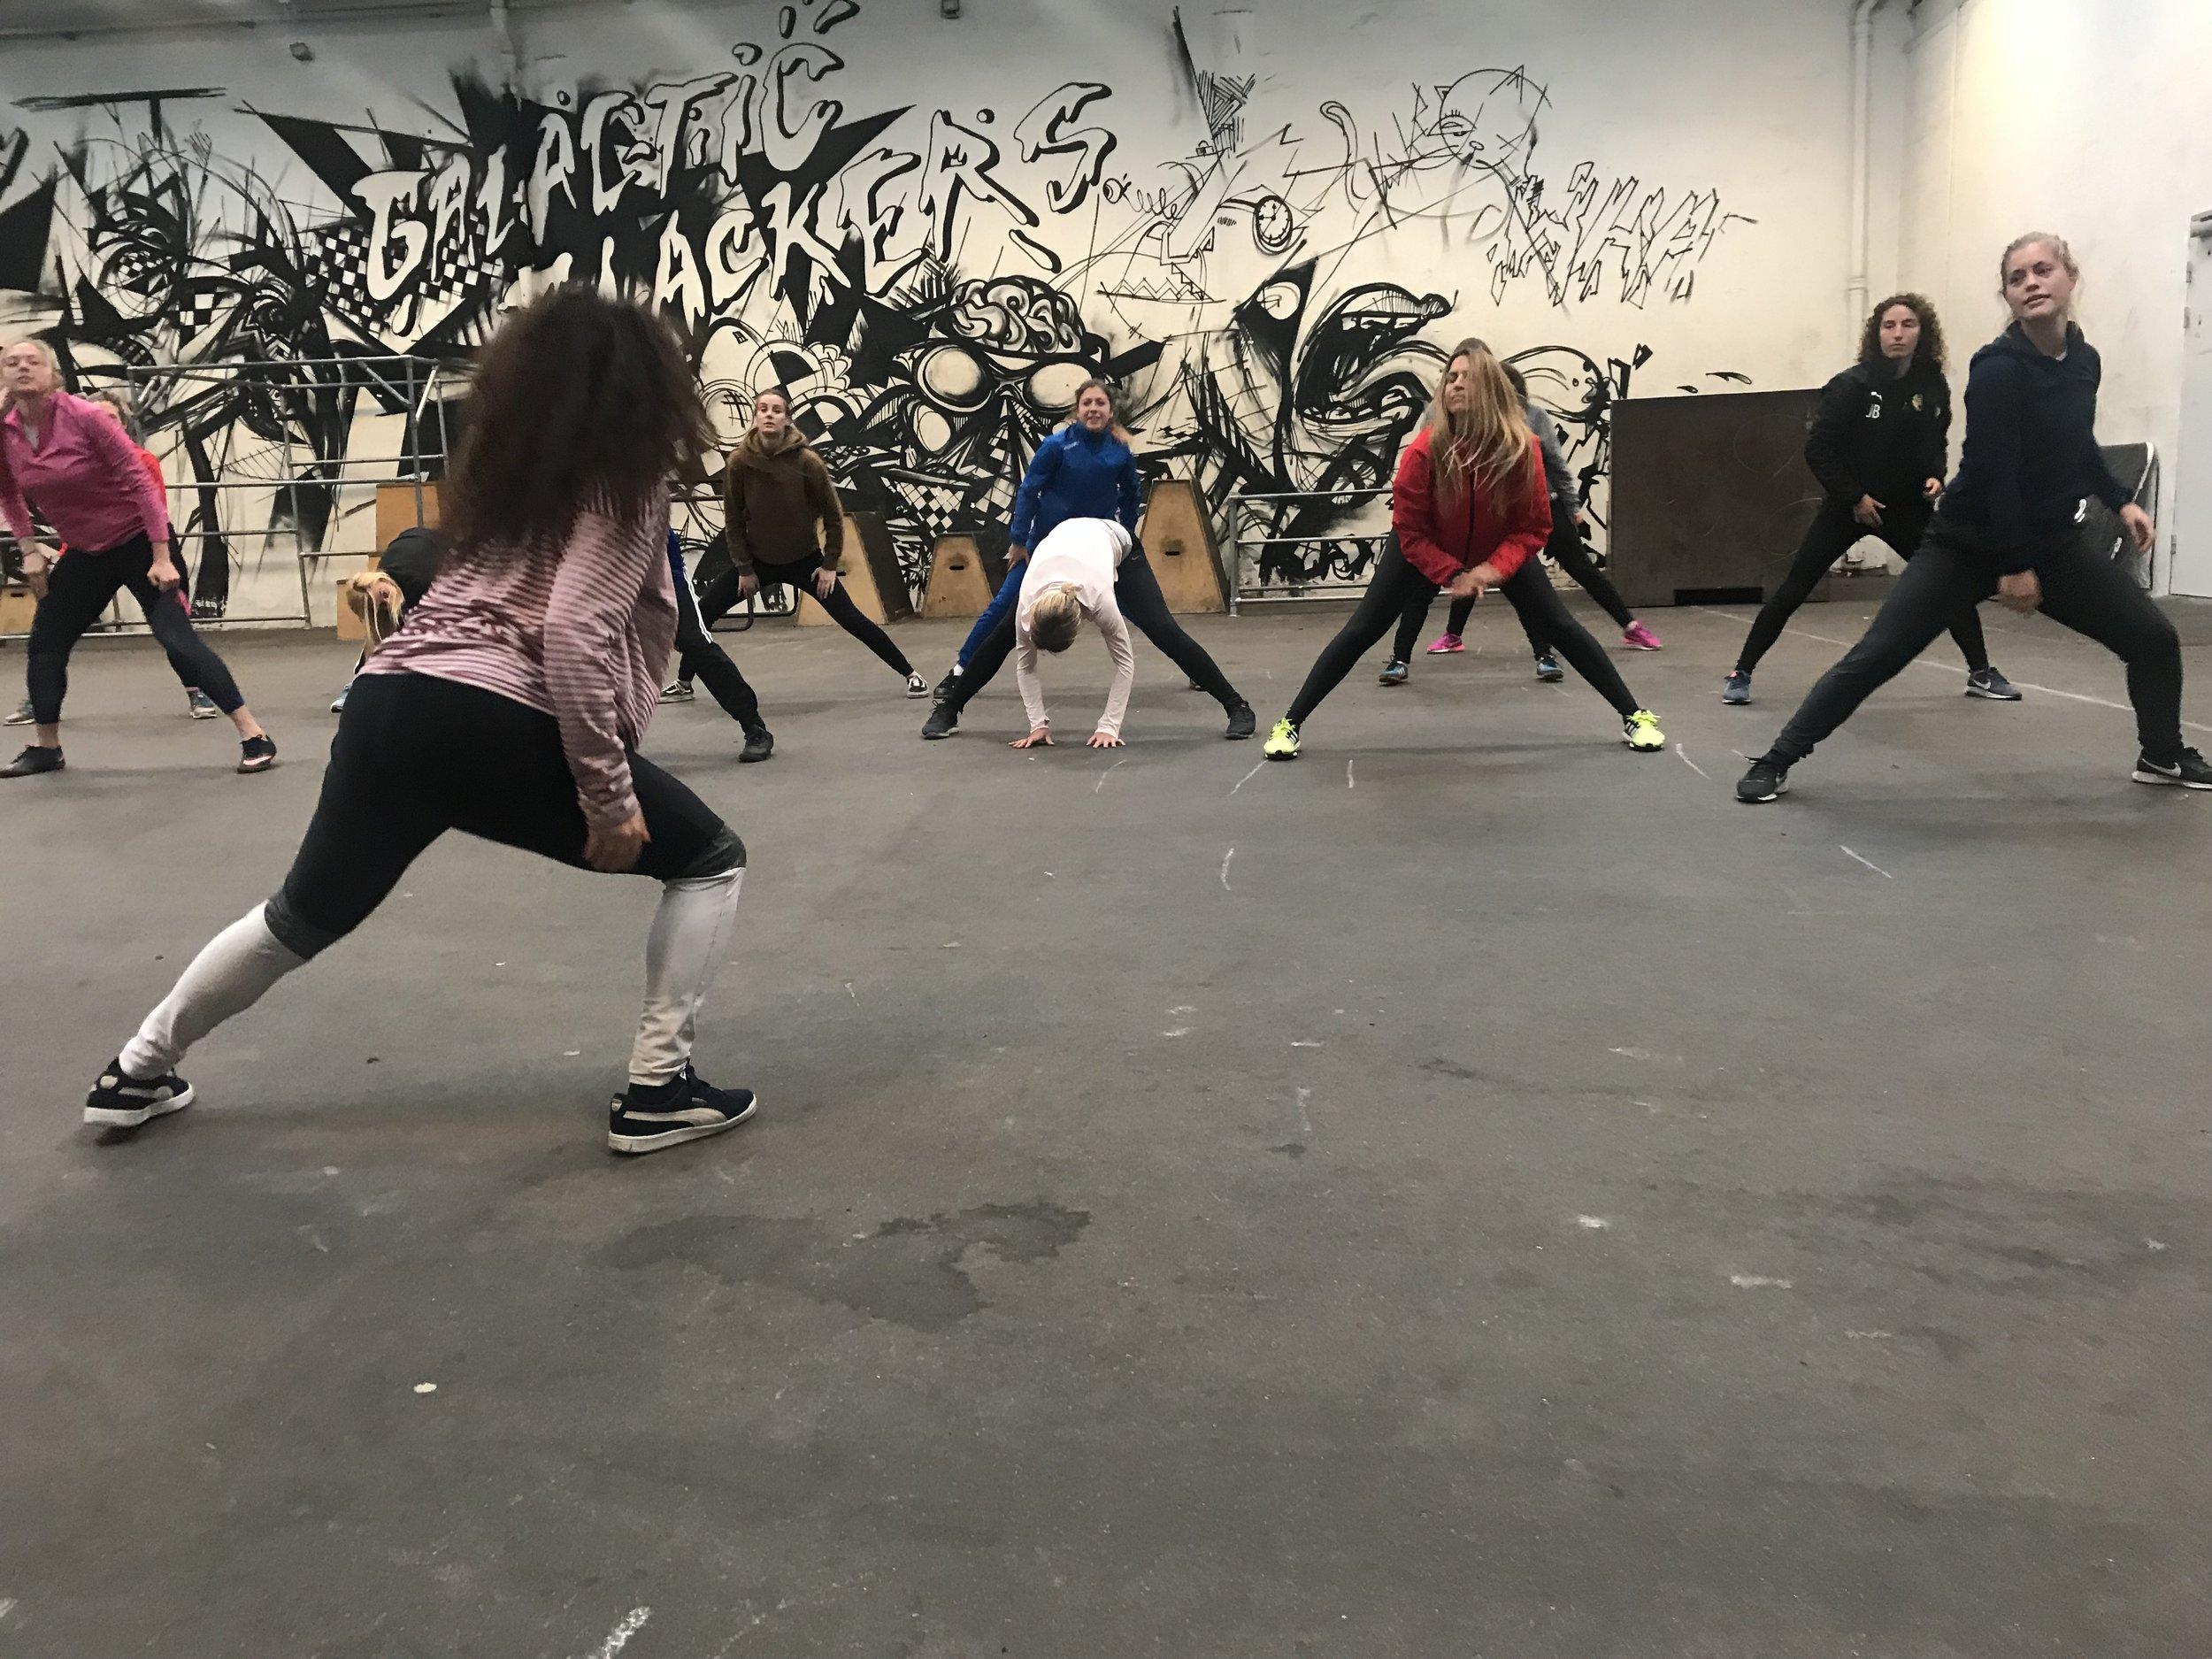 A beginners mind: dancing